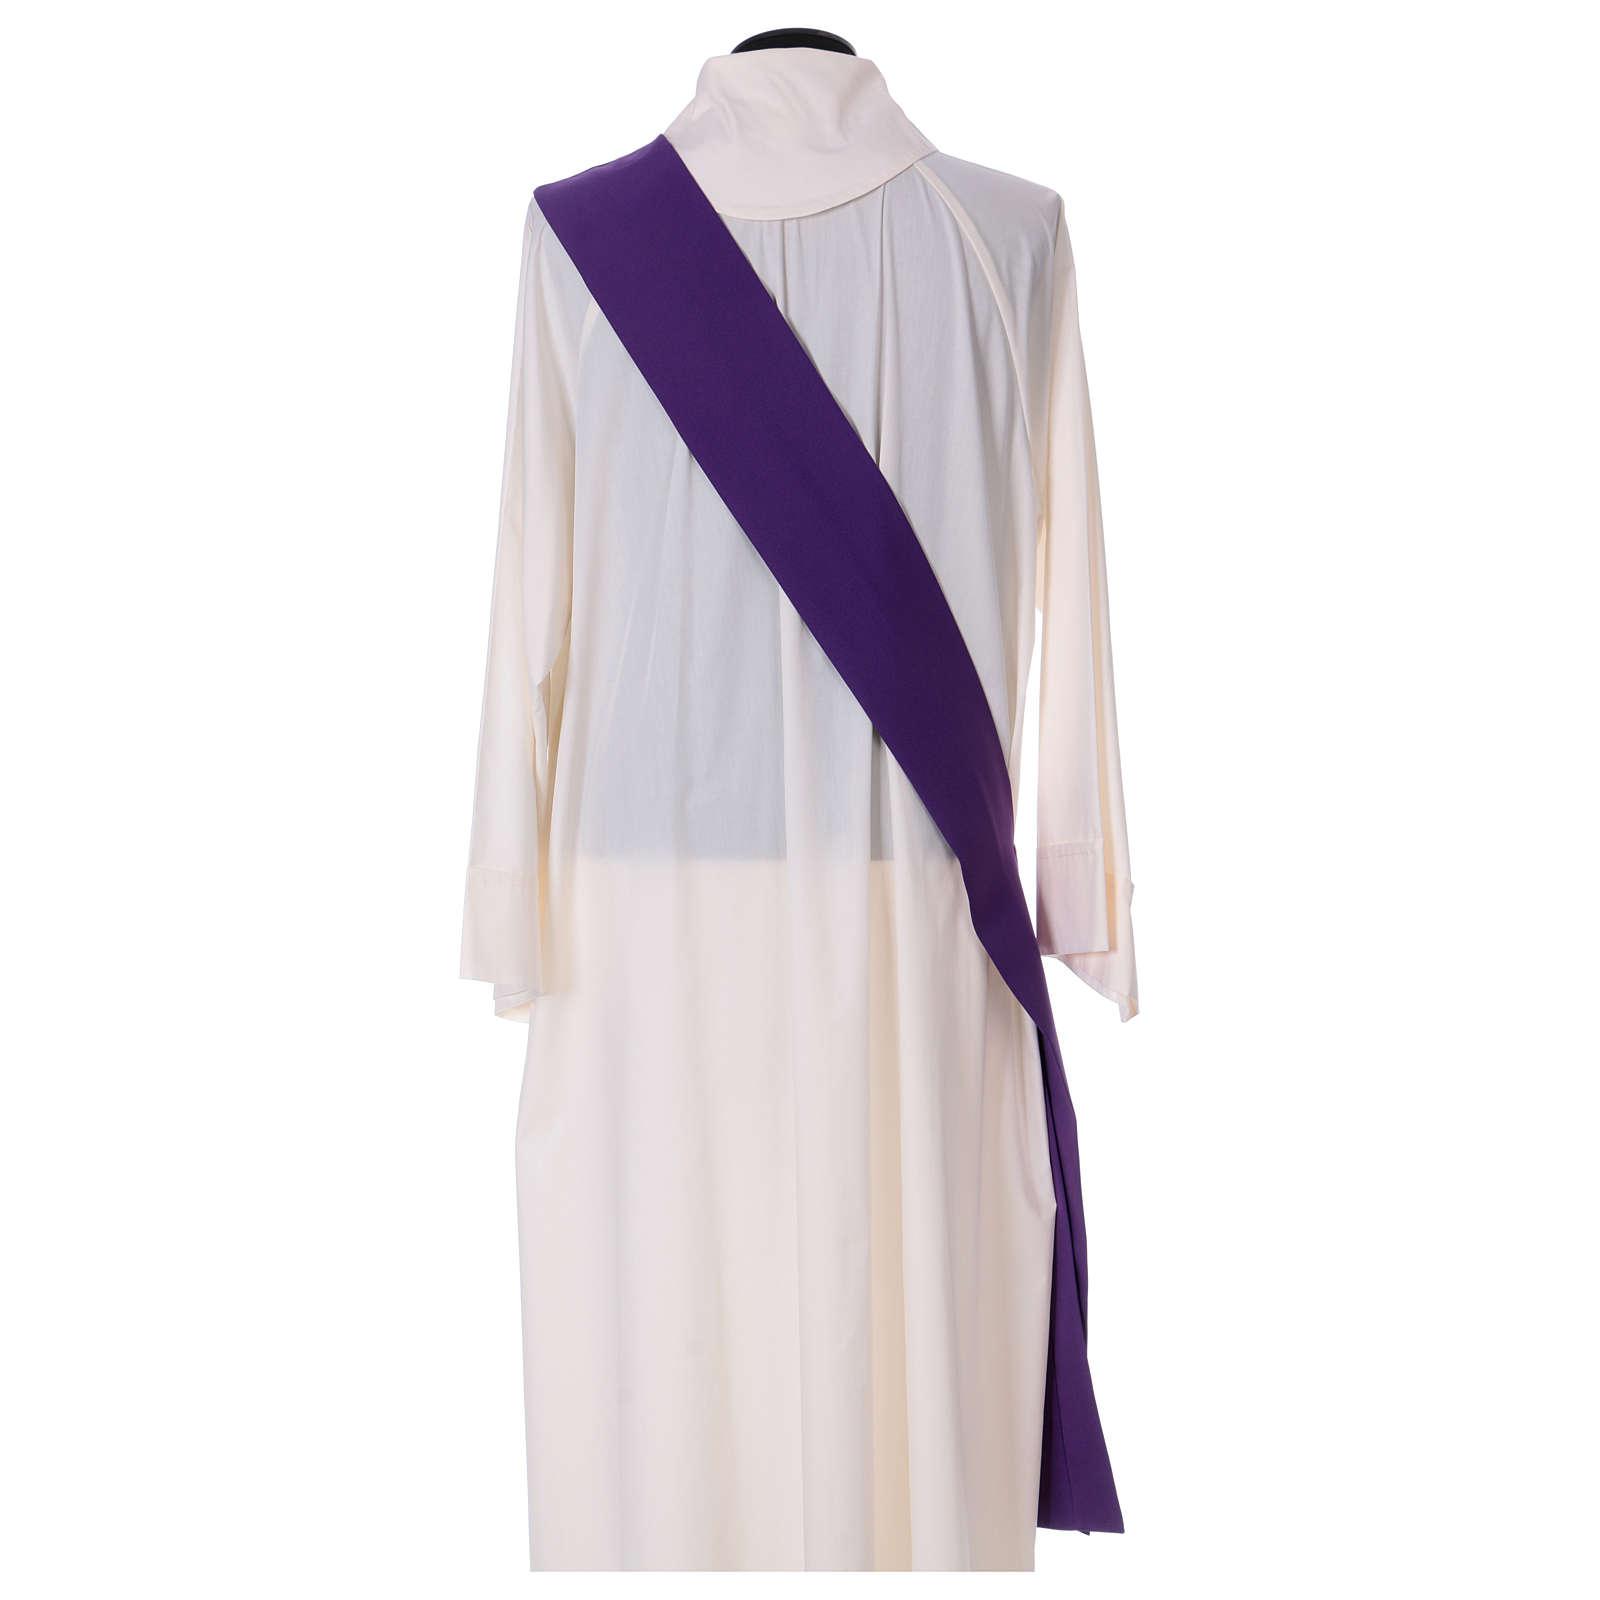 Dalmática entorchado aplicado parte anterior posterior tejido 100% poliéster Vatican 4